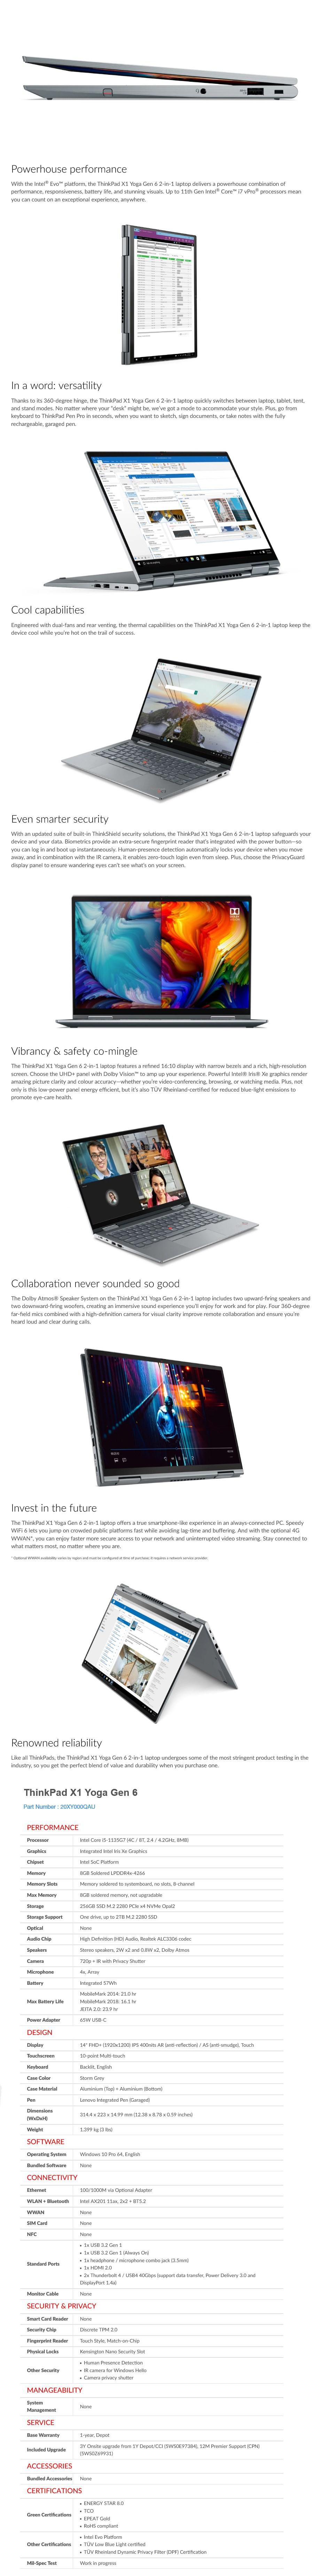 lenovo-thinkpad-x1-yoga-gen-6-flip-14-laptop-i51135g7-8gb-256gb-w10p-touch-ac44411-8.jpg